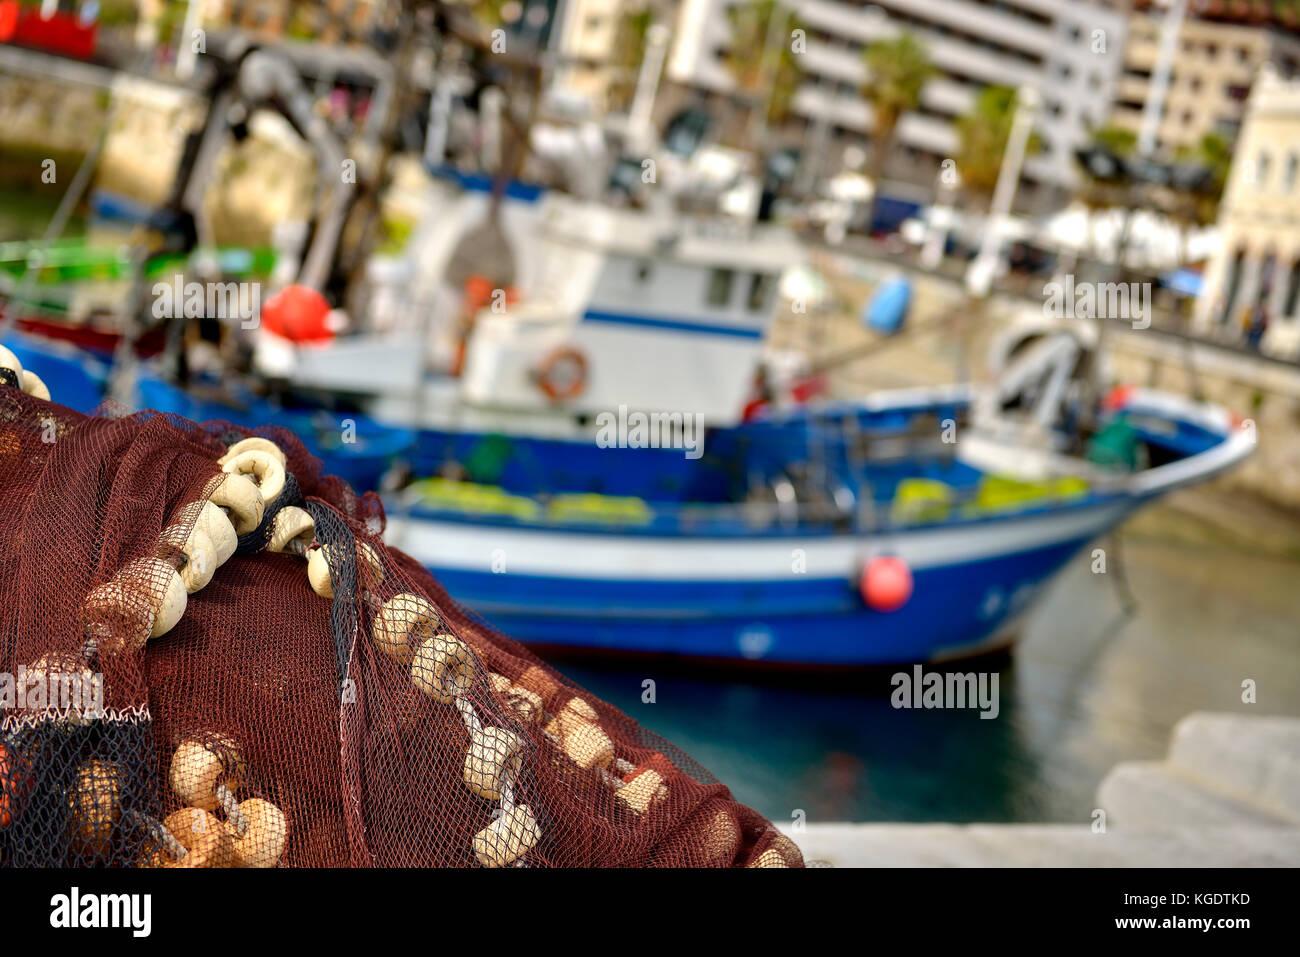 Fishing gear in Santurce, Biscay, Basque Country, Euskadi, Spain, Europe - Stock Image